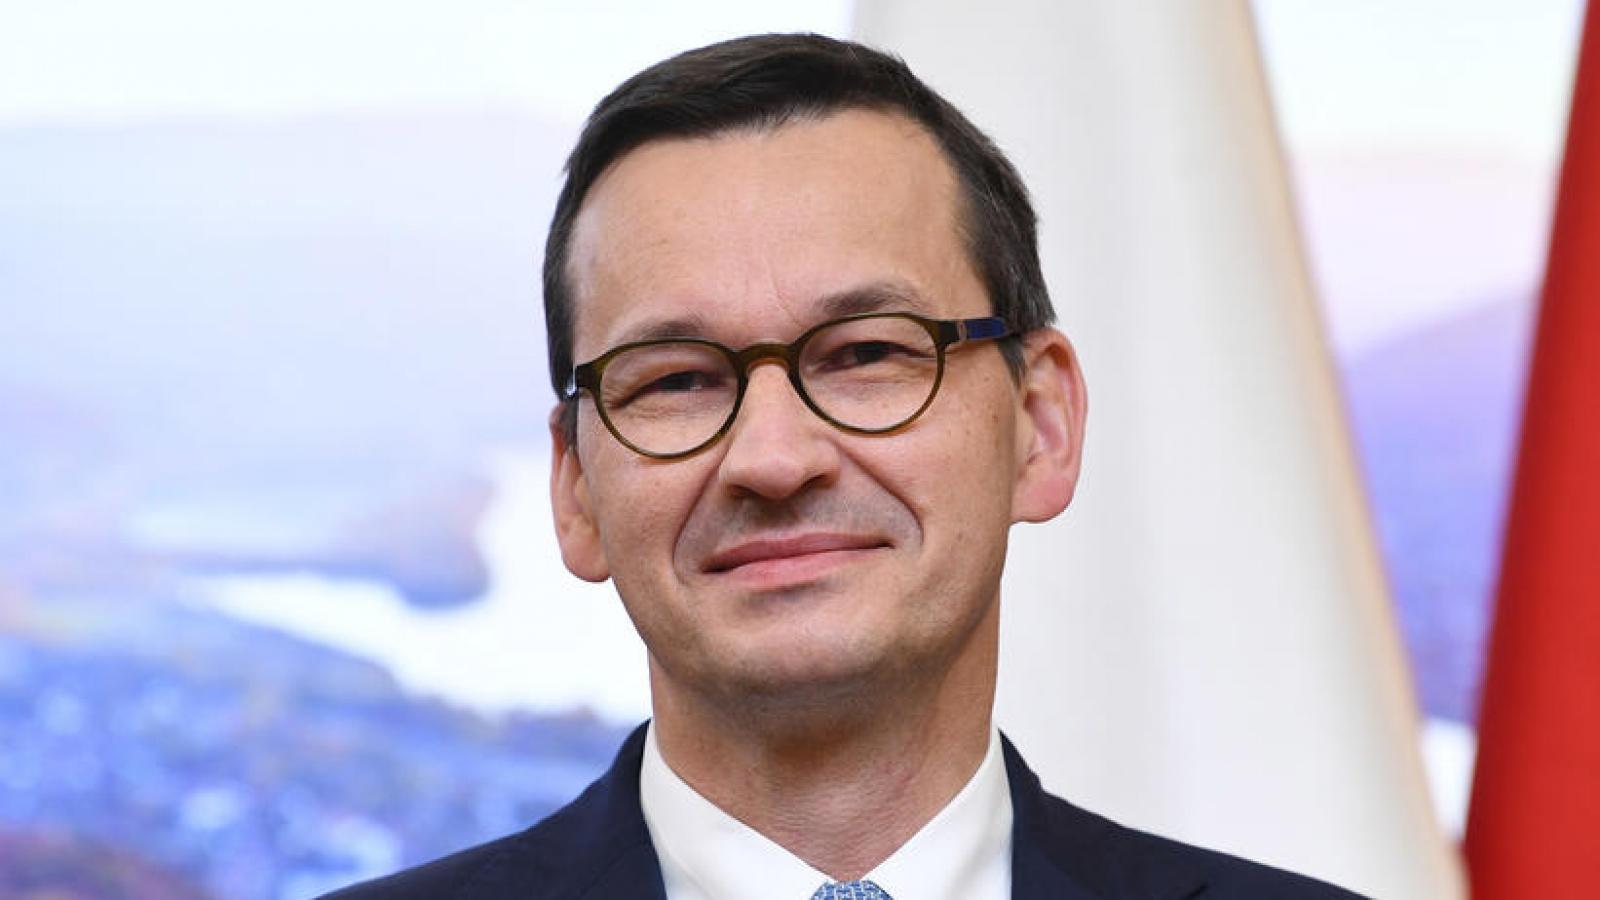 Ba Lan triển khai kế hoạch phục hồi kinh tế thời hậu Covid-19